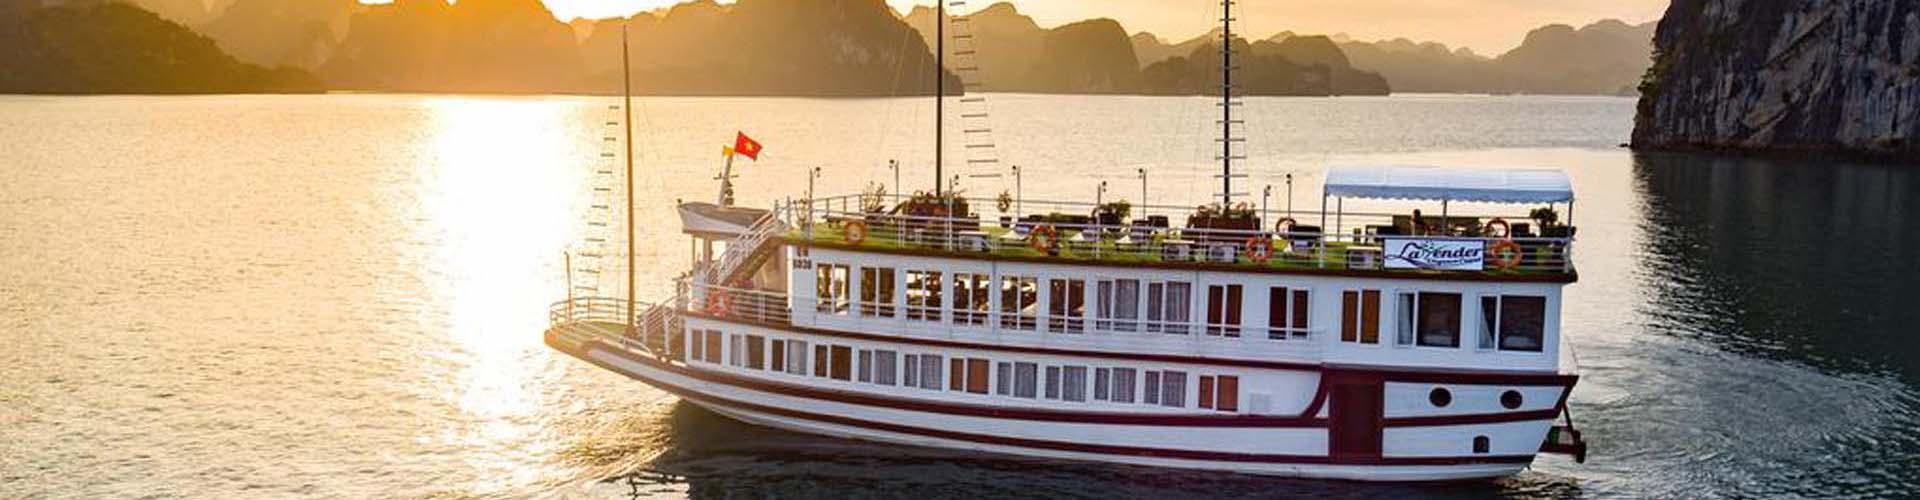 Lavender Cruise